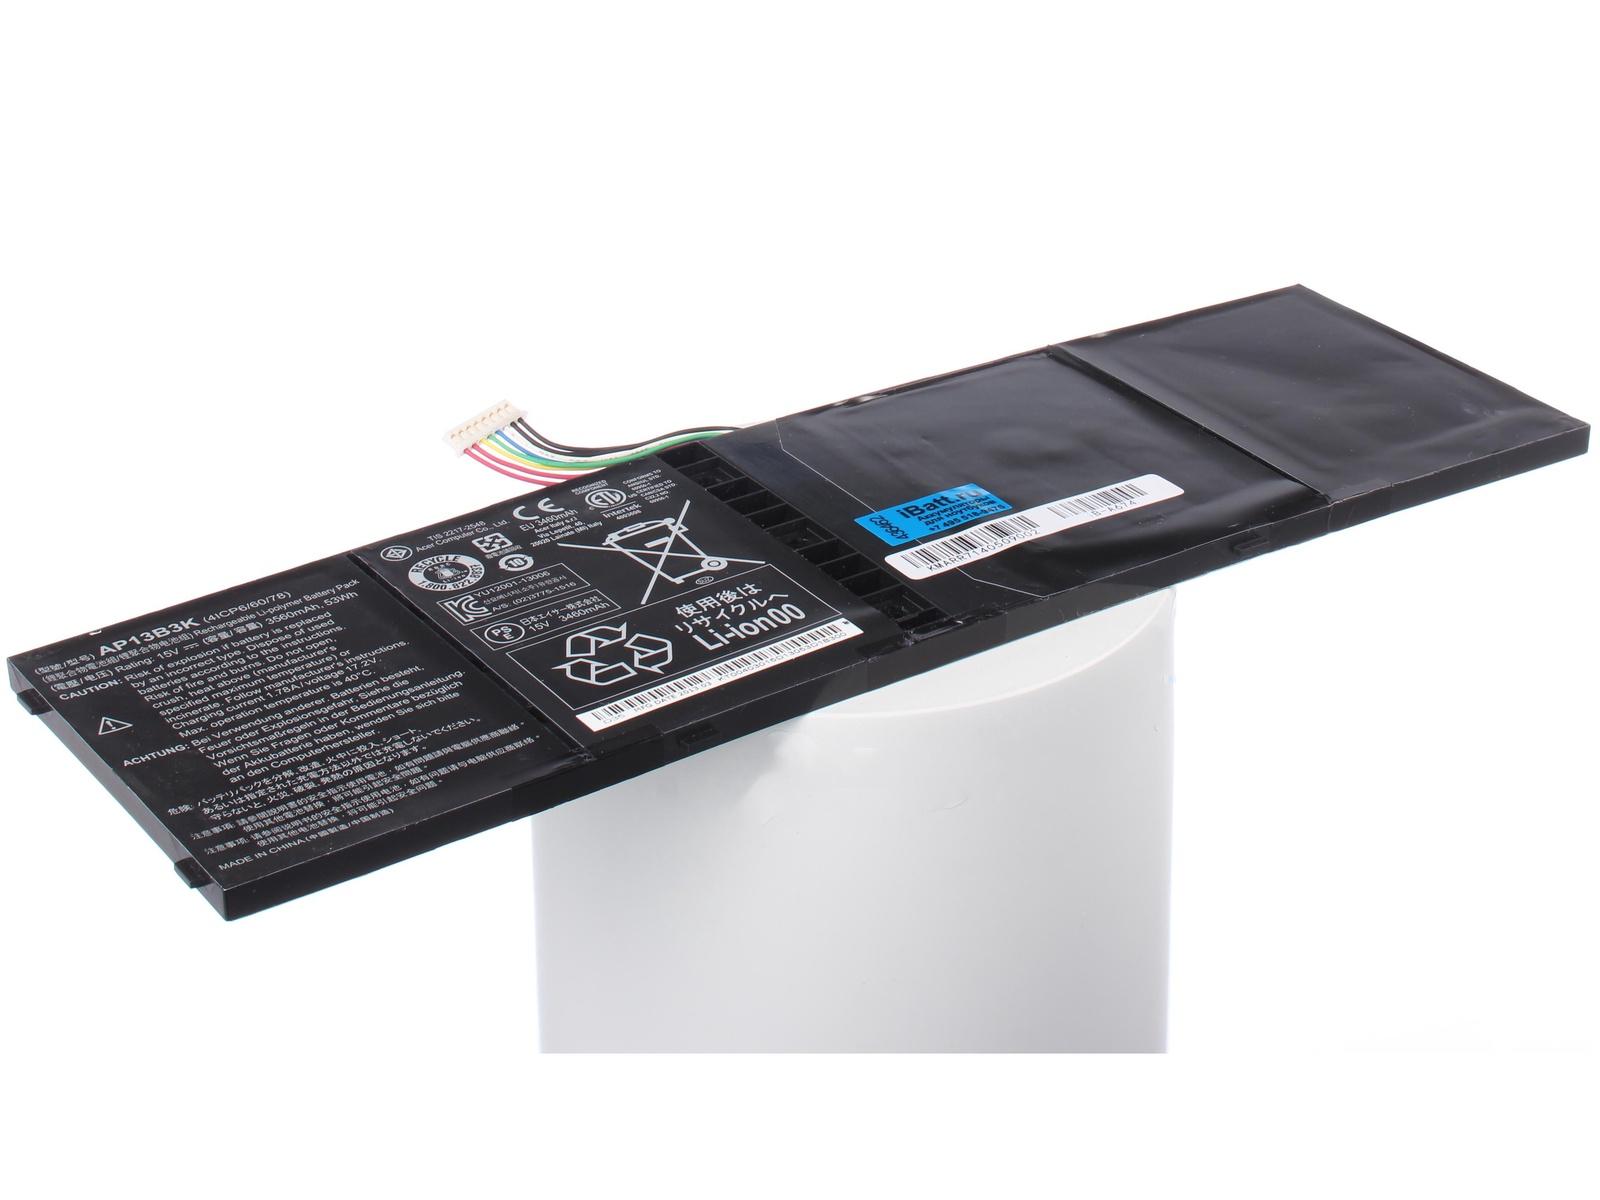 Аккумулятор для ноутбука iBatt для Acer Aspire V5-472PG-53336G50aii, Aspire F5-572G-56FY, Aspire V5-572G-53338G50akk, Aspire V5-572G-73538G50aii, Aspire V5-573G-54208G1Takk, Aspire V5-573G-54216G1Taii цена